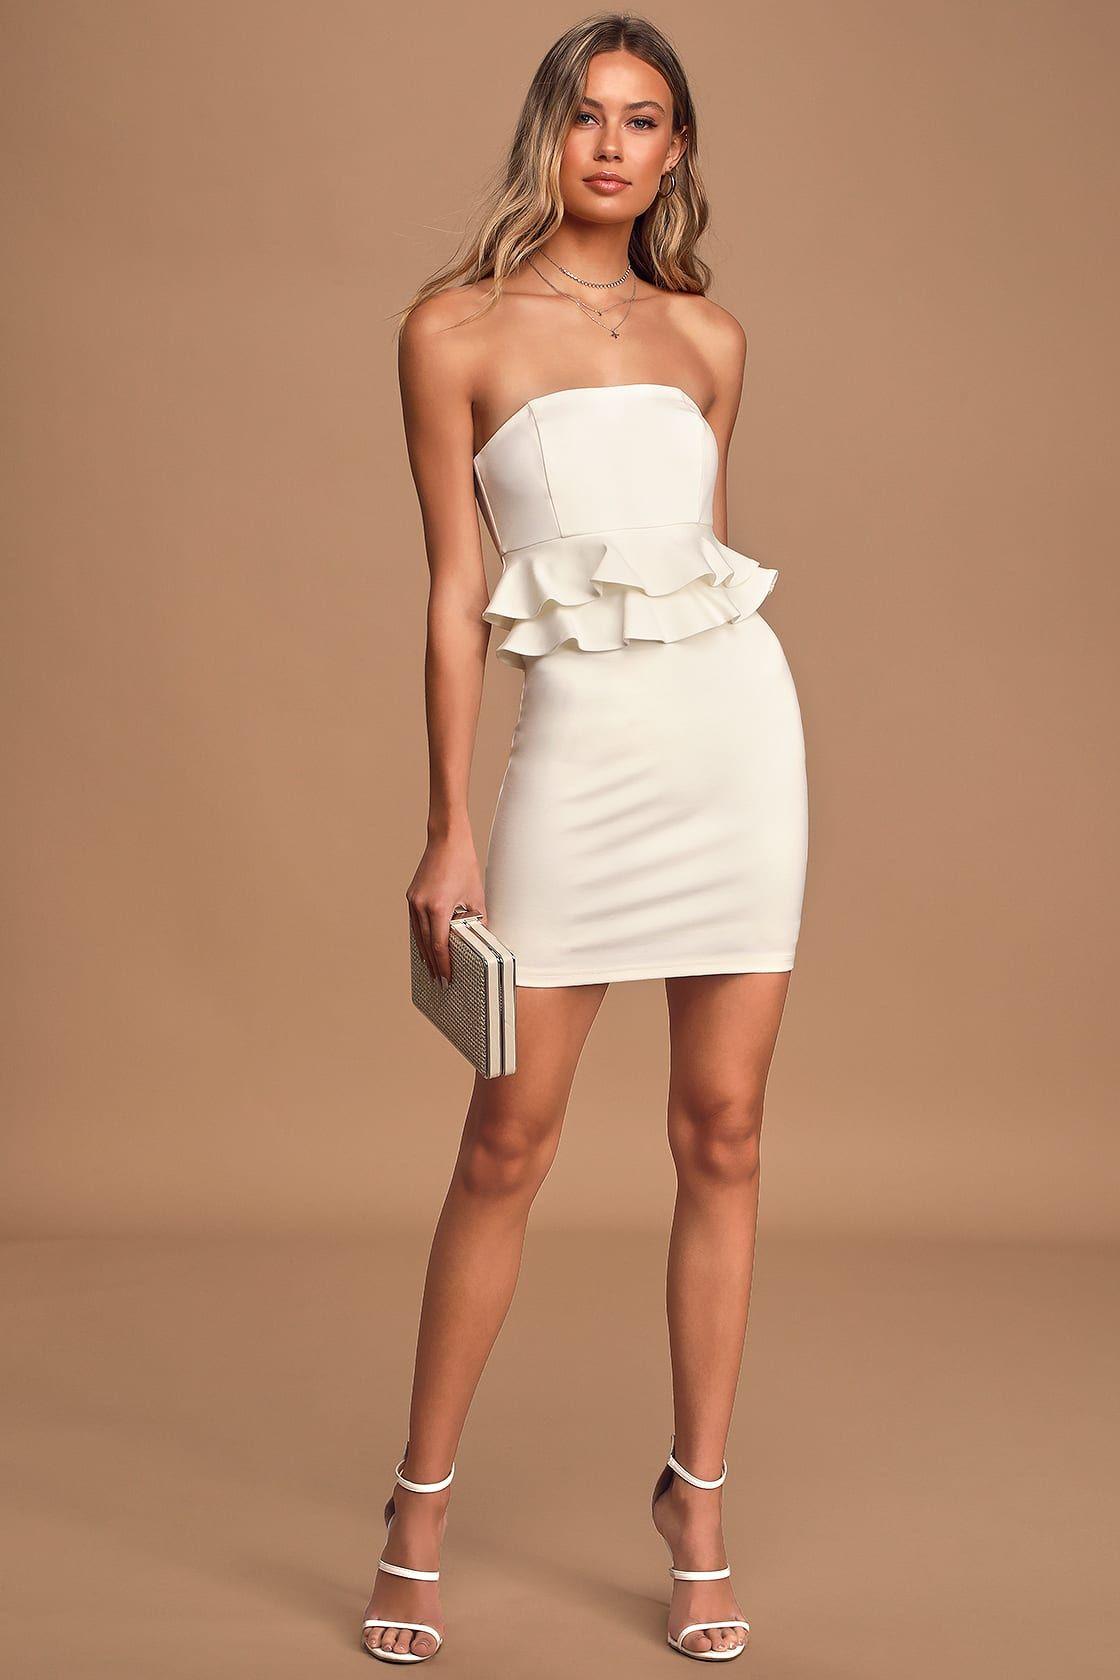 Glam Up Ivory Strapless Ruffled Bodycon Mini Dress Mini Dress Bodycon Mini Dress Pretty Midi Dresses [ 1680 x 1120 Pixel ]